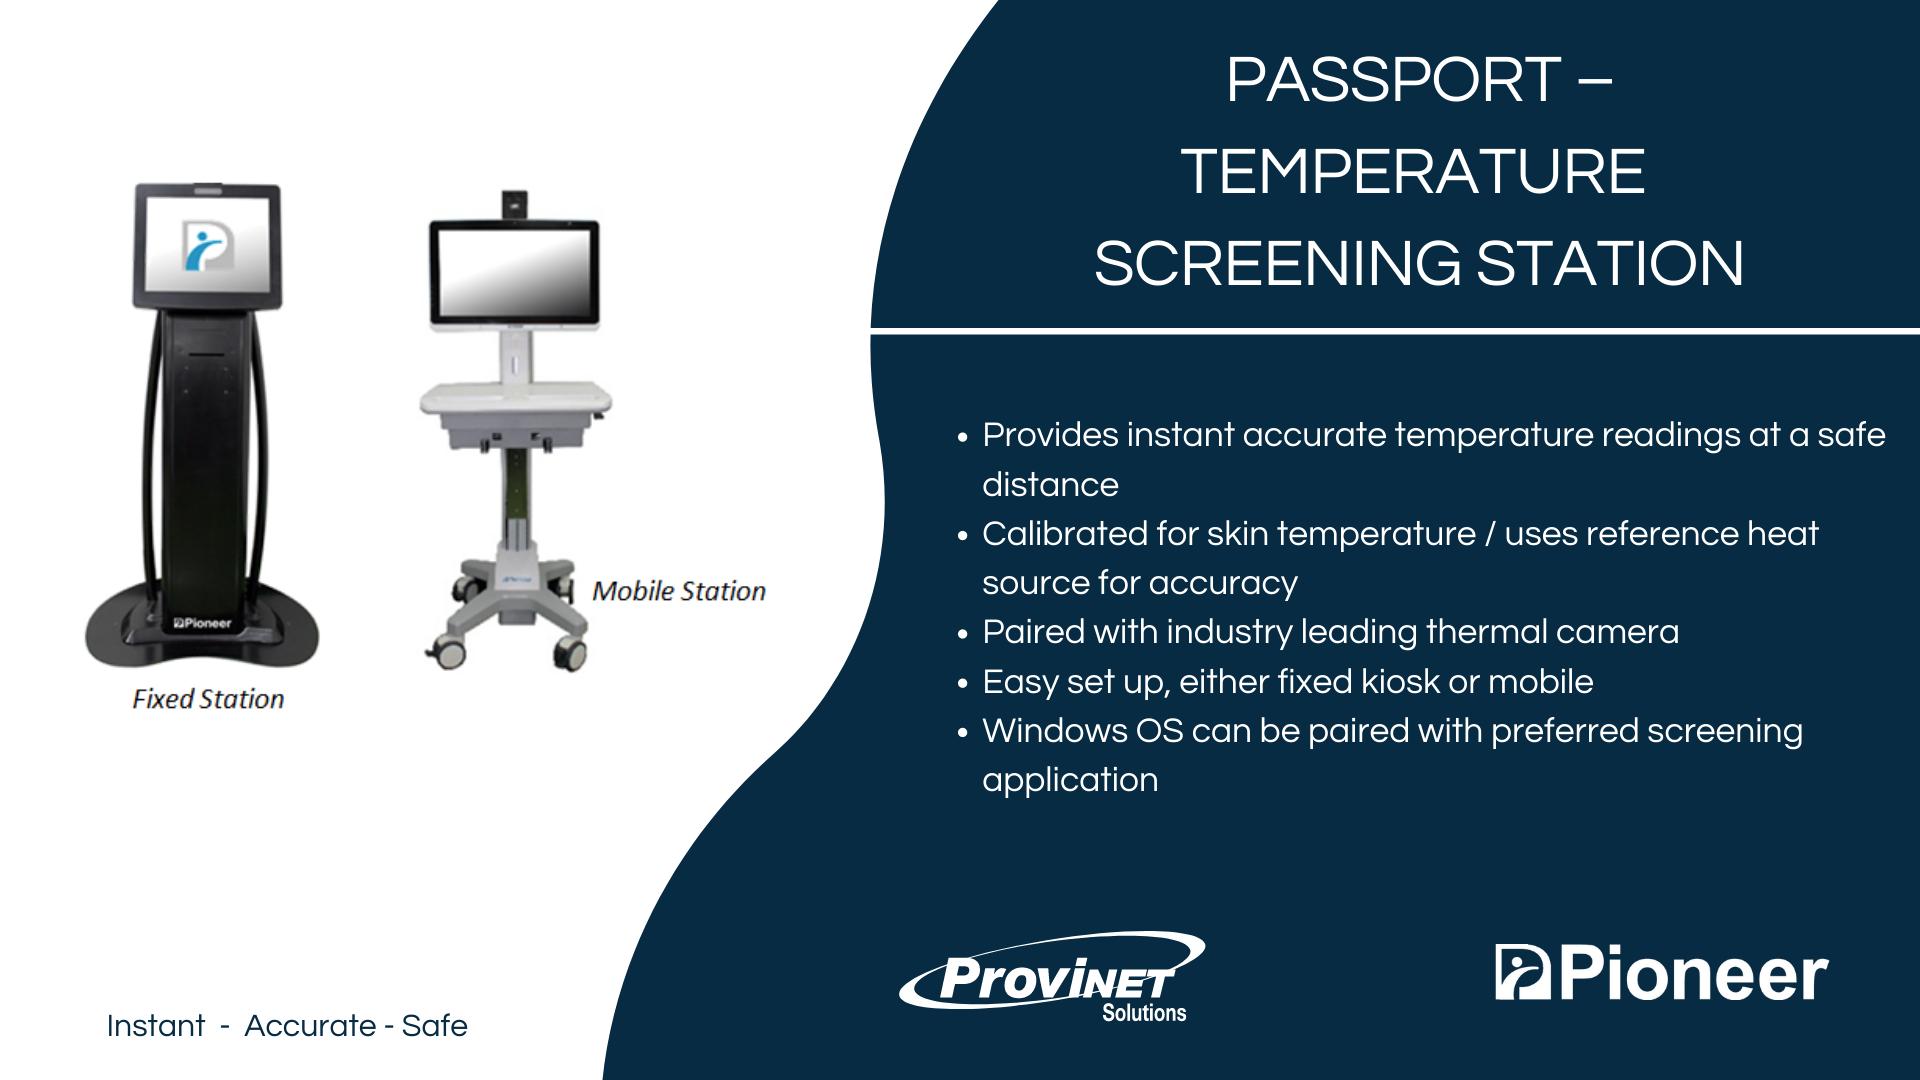 Passport – Temperature Screening Station